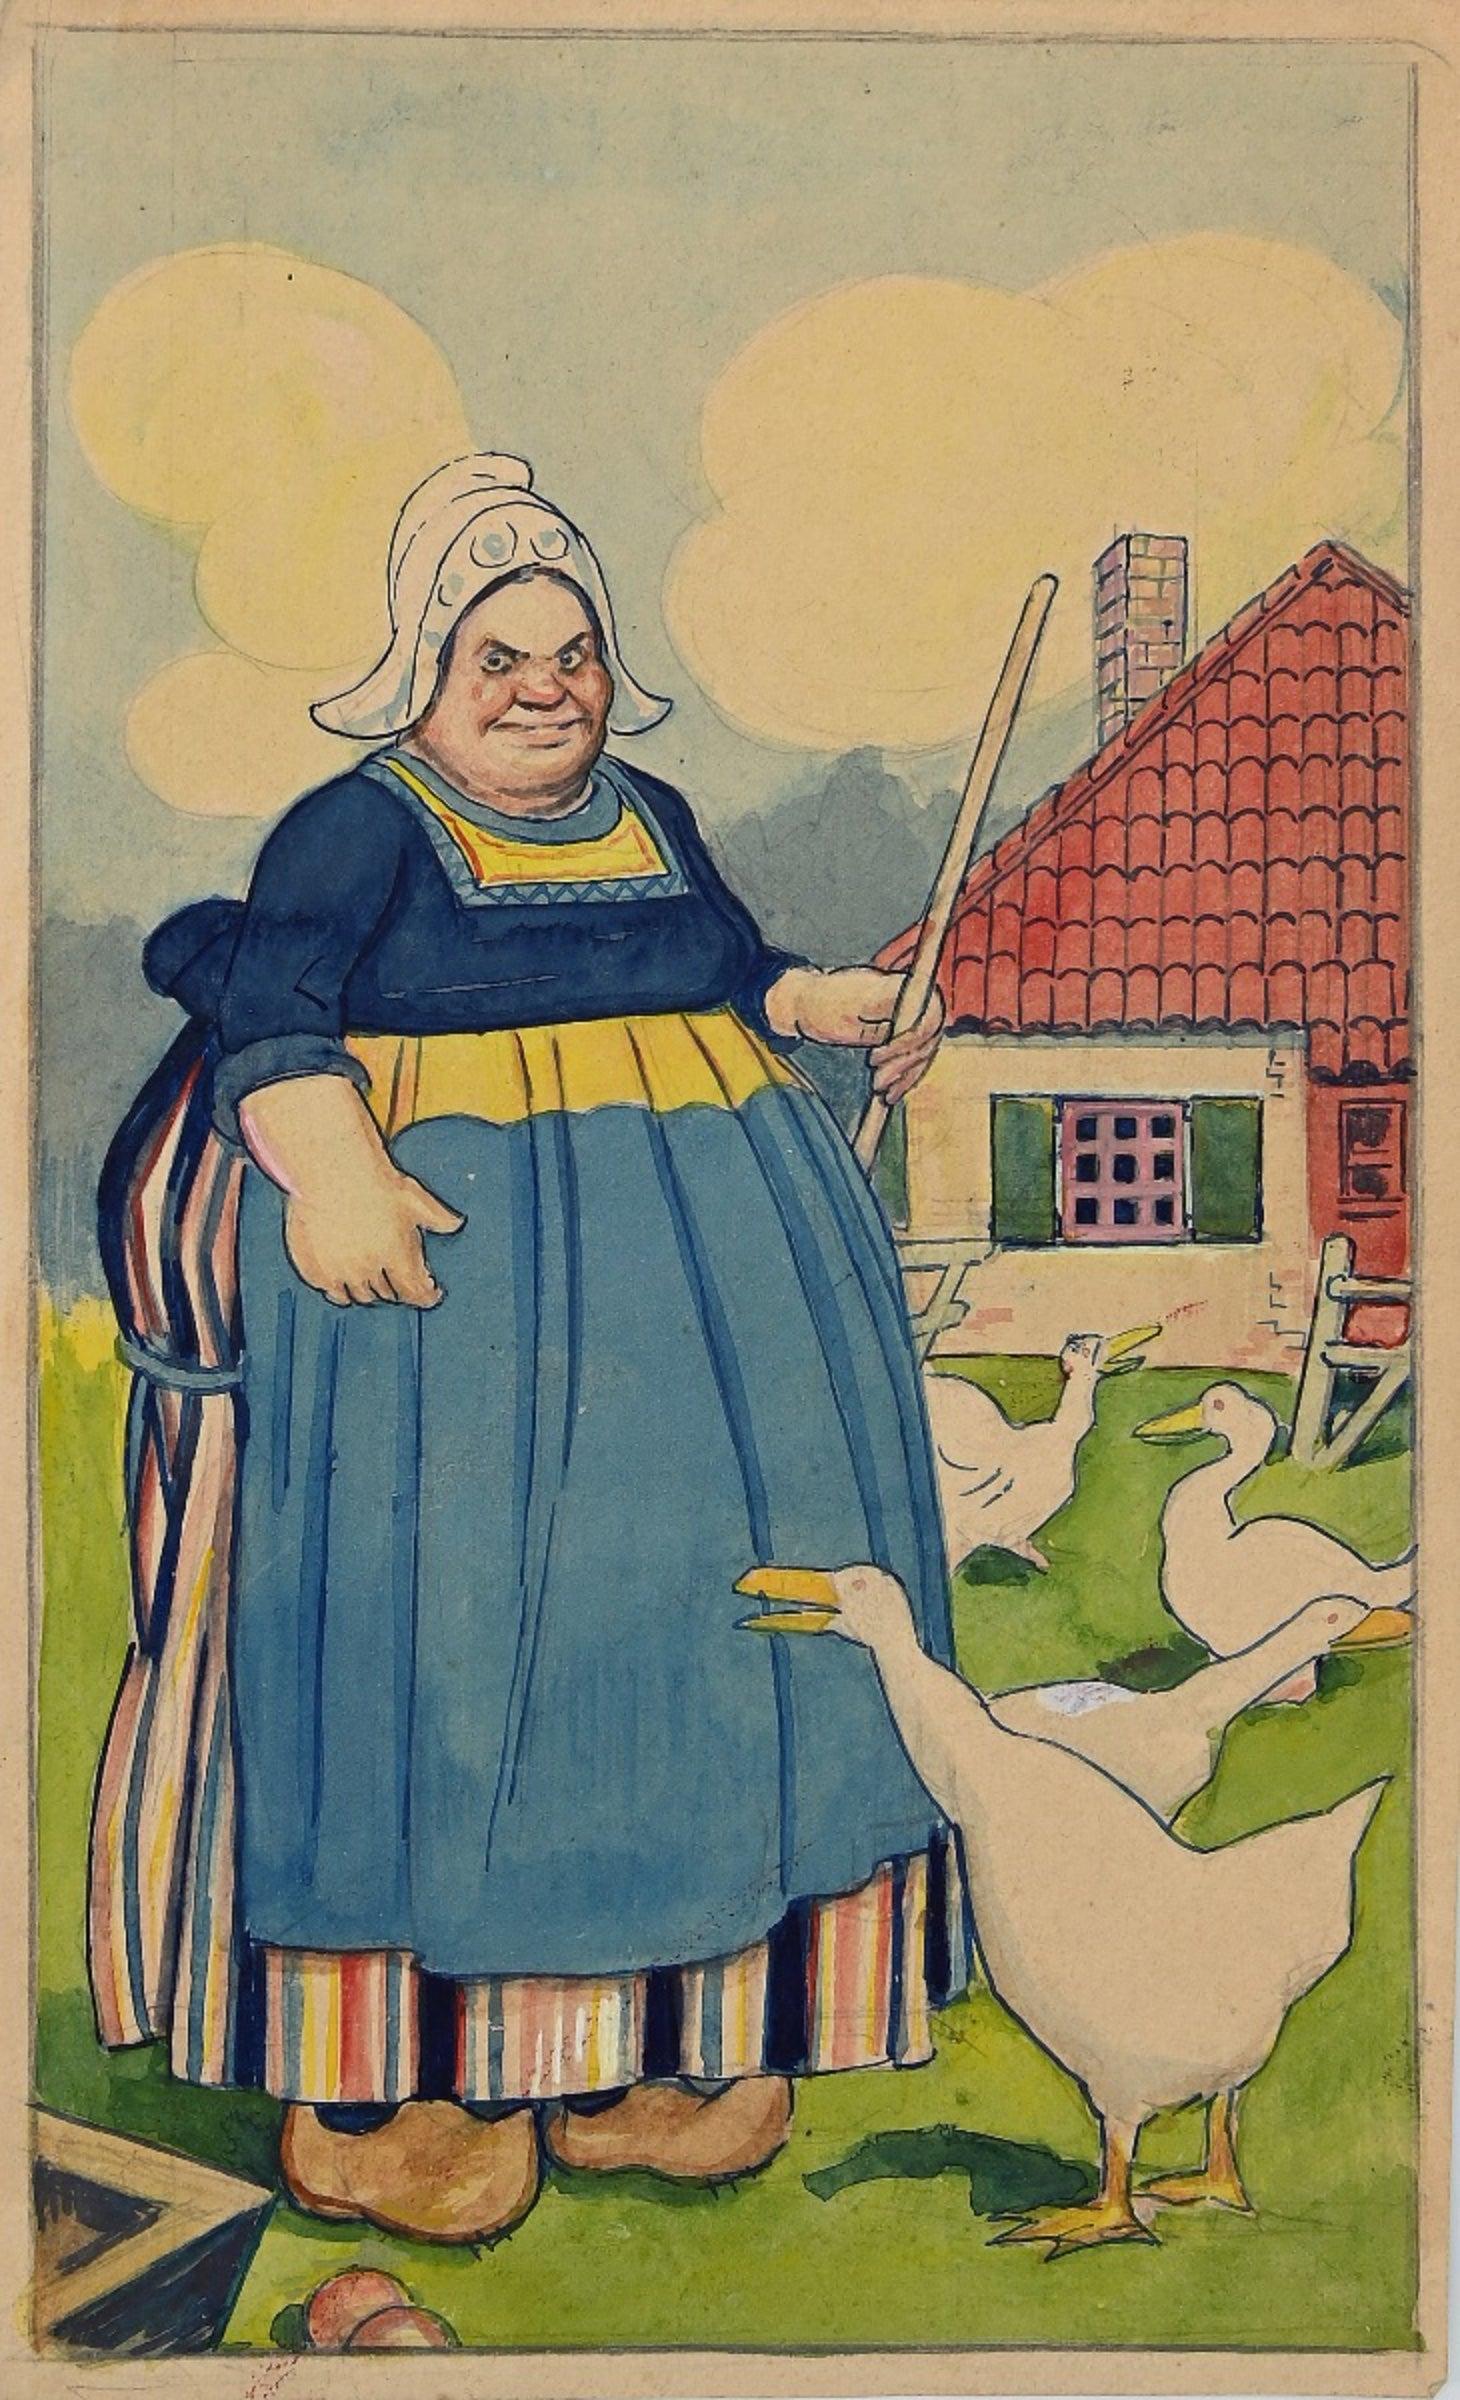 Peasant Woman with Geese - Original Drawing by Gabriele Galantara - 1915